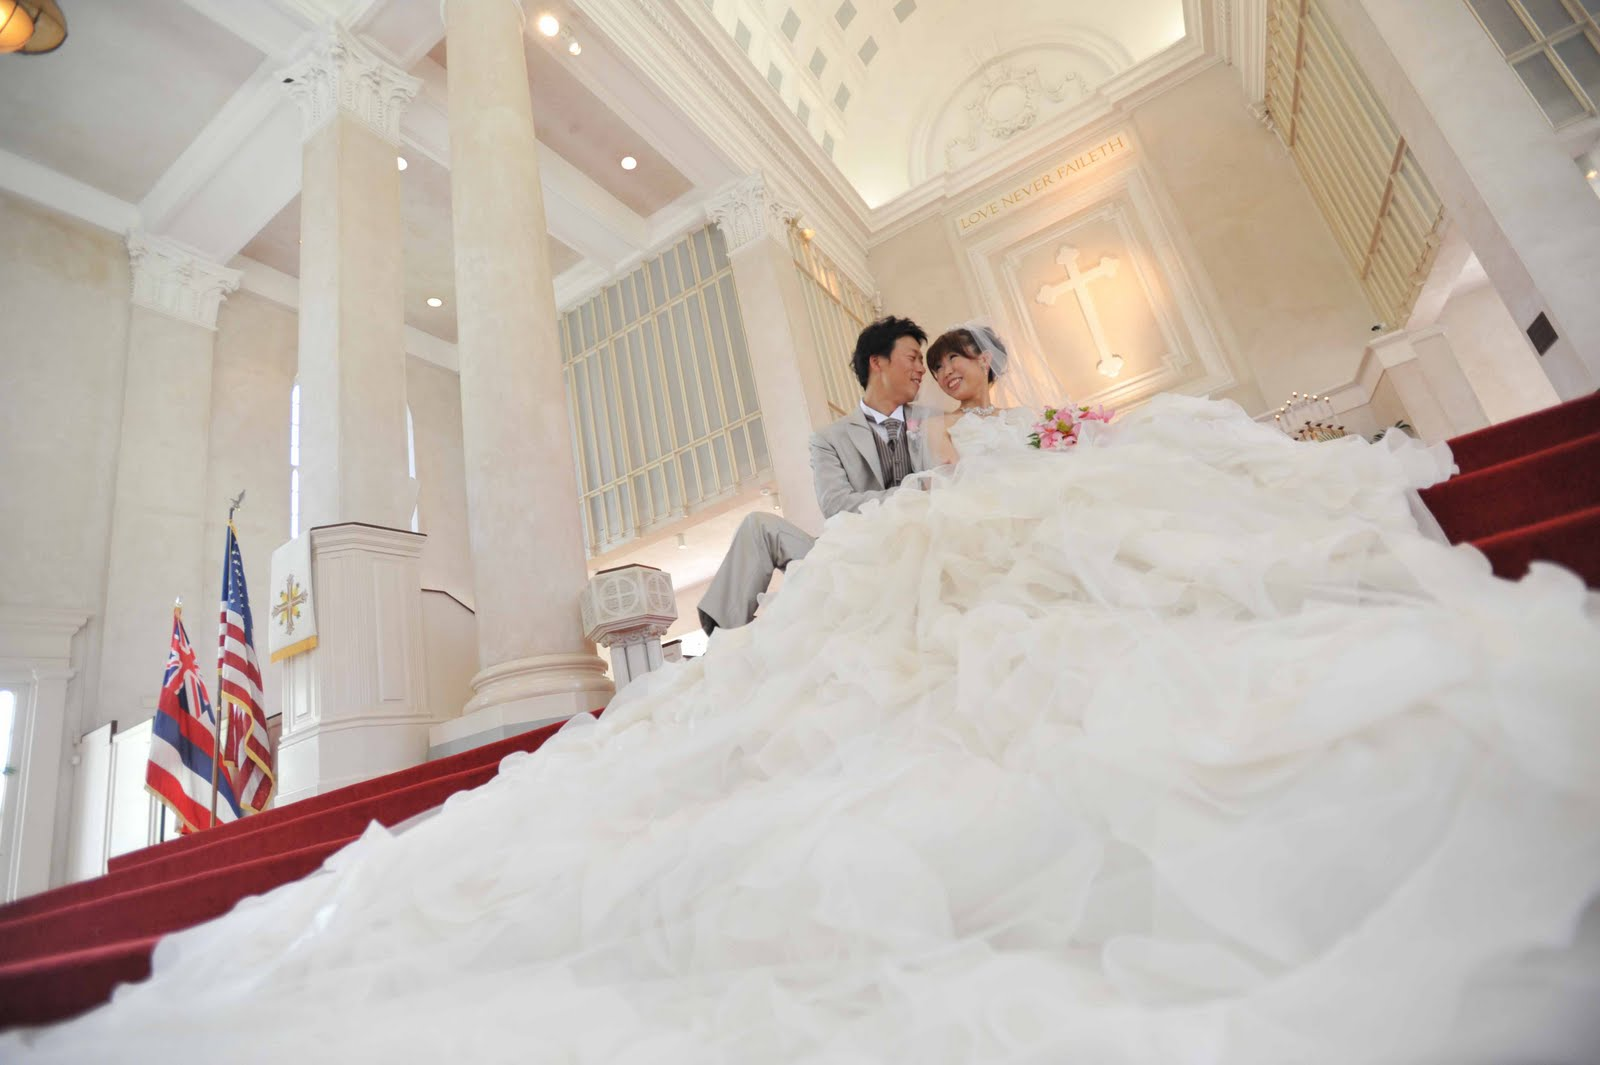 Central union wedding